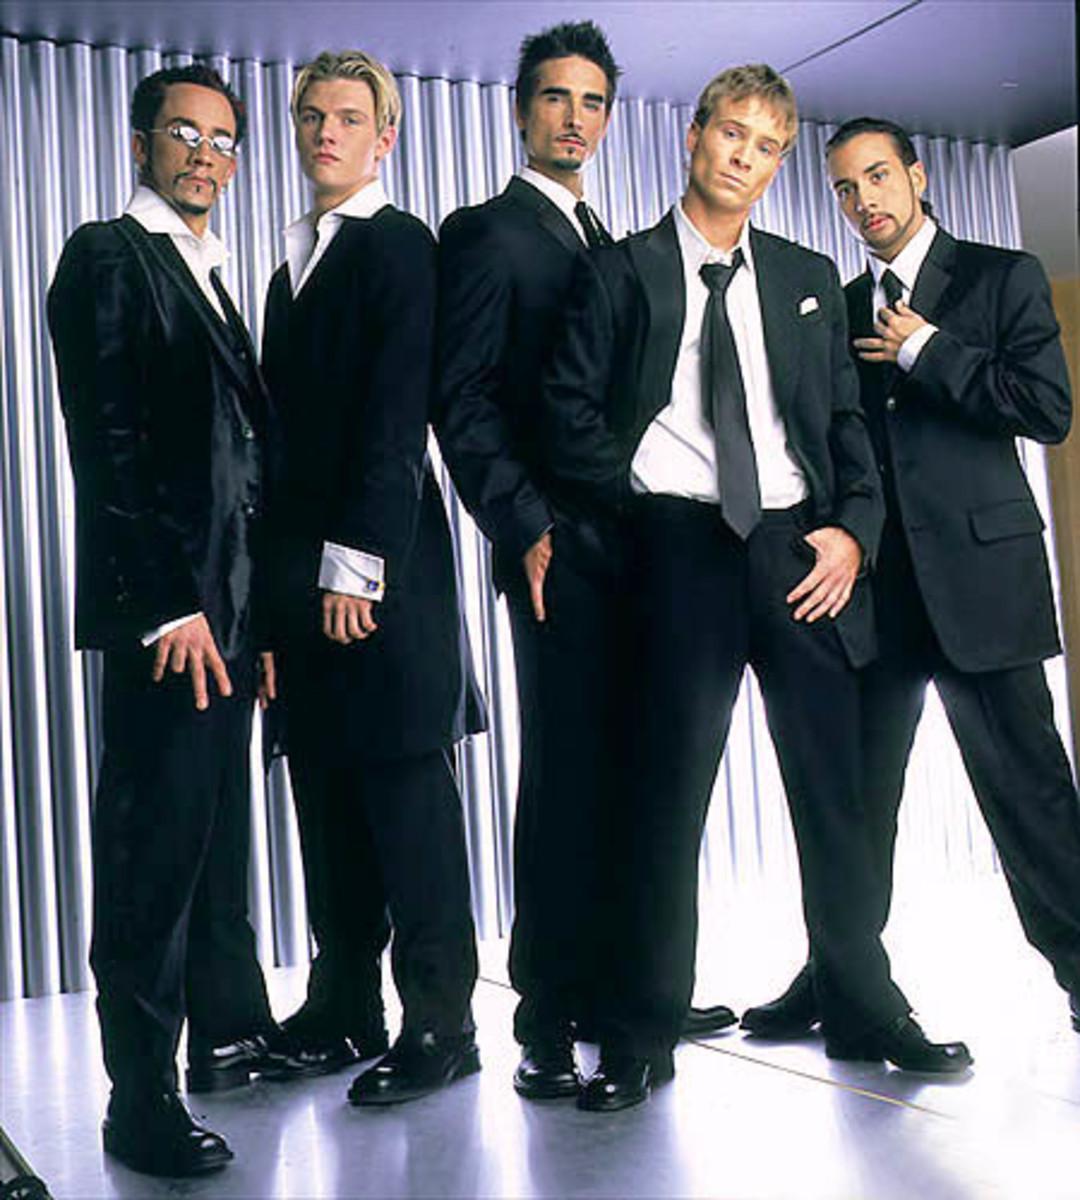 Open Letter to the Backstreet Boys